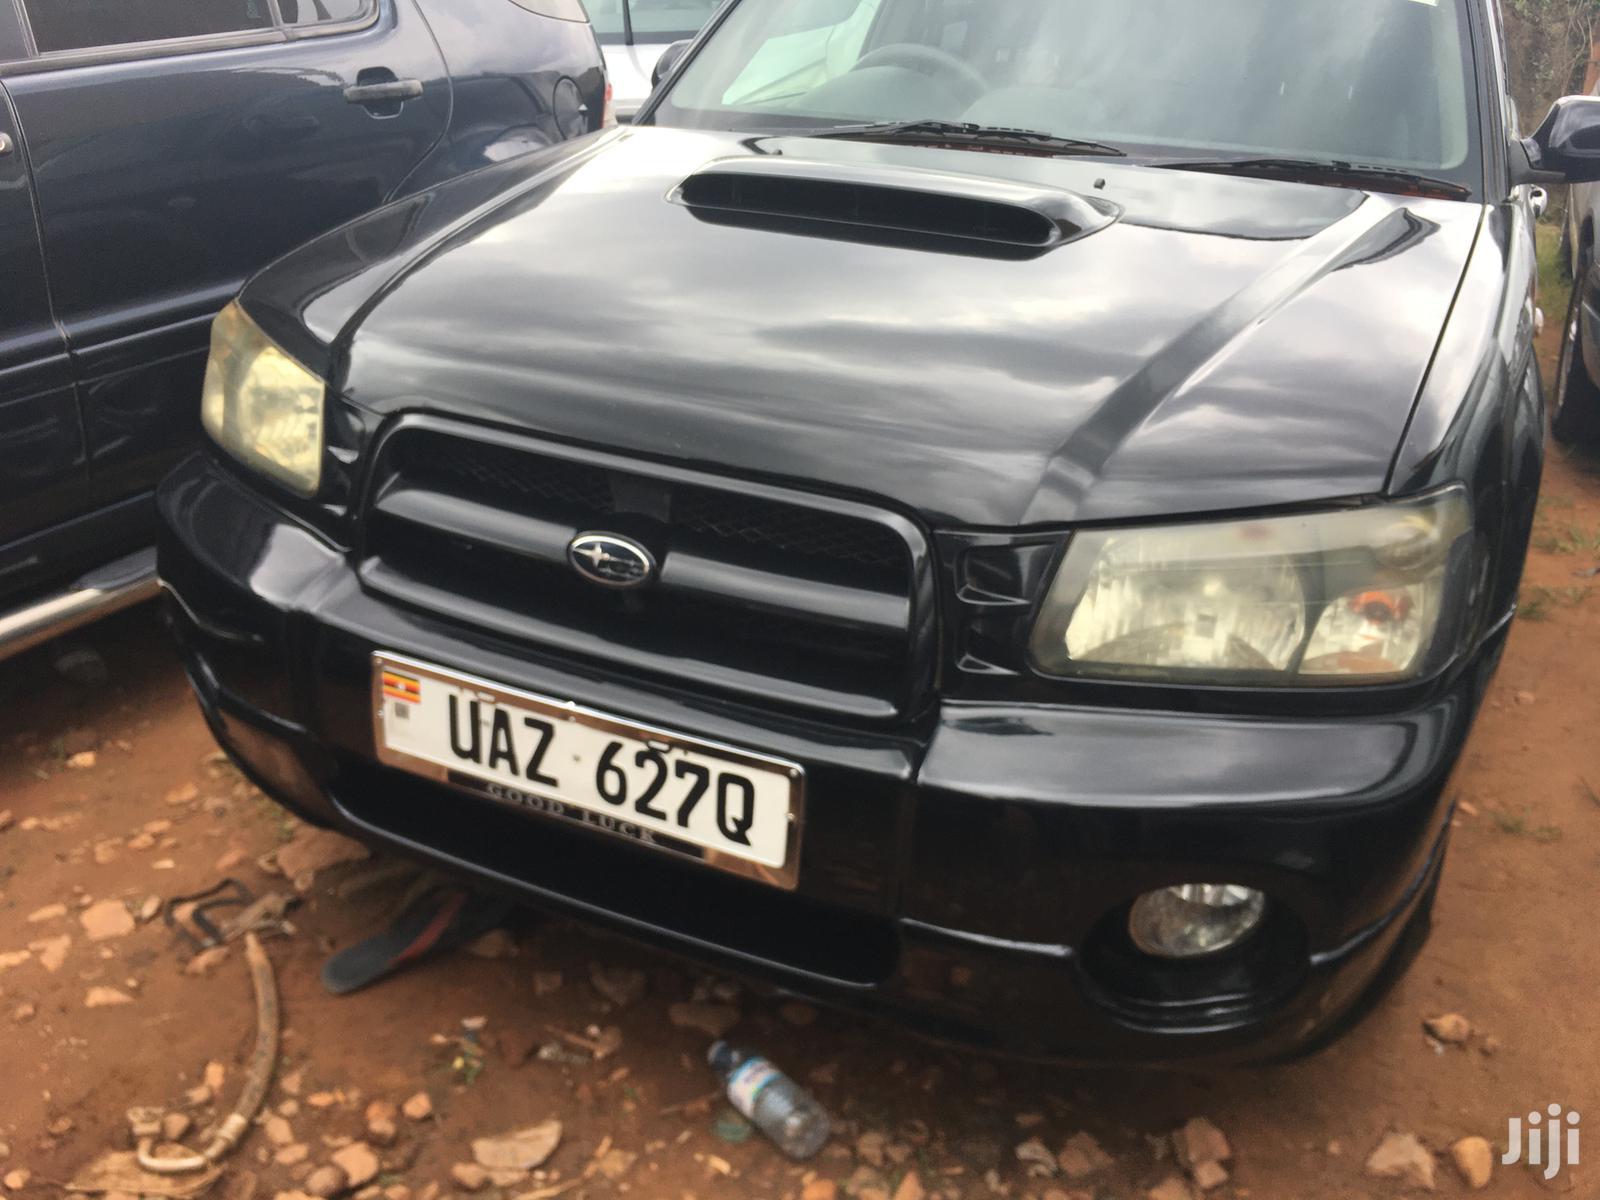 Subaru Forester 2003 Black | Cars for sale in Kampala, Central Region, Uganda